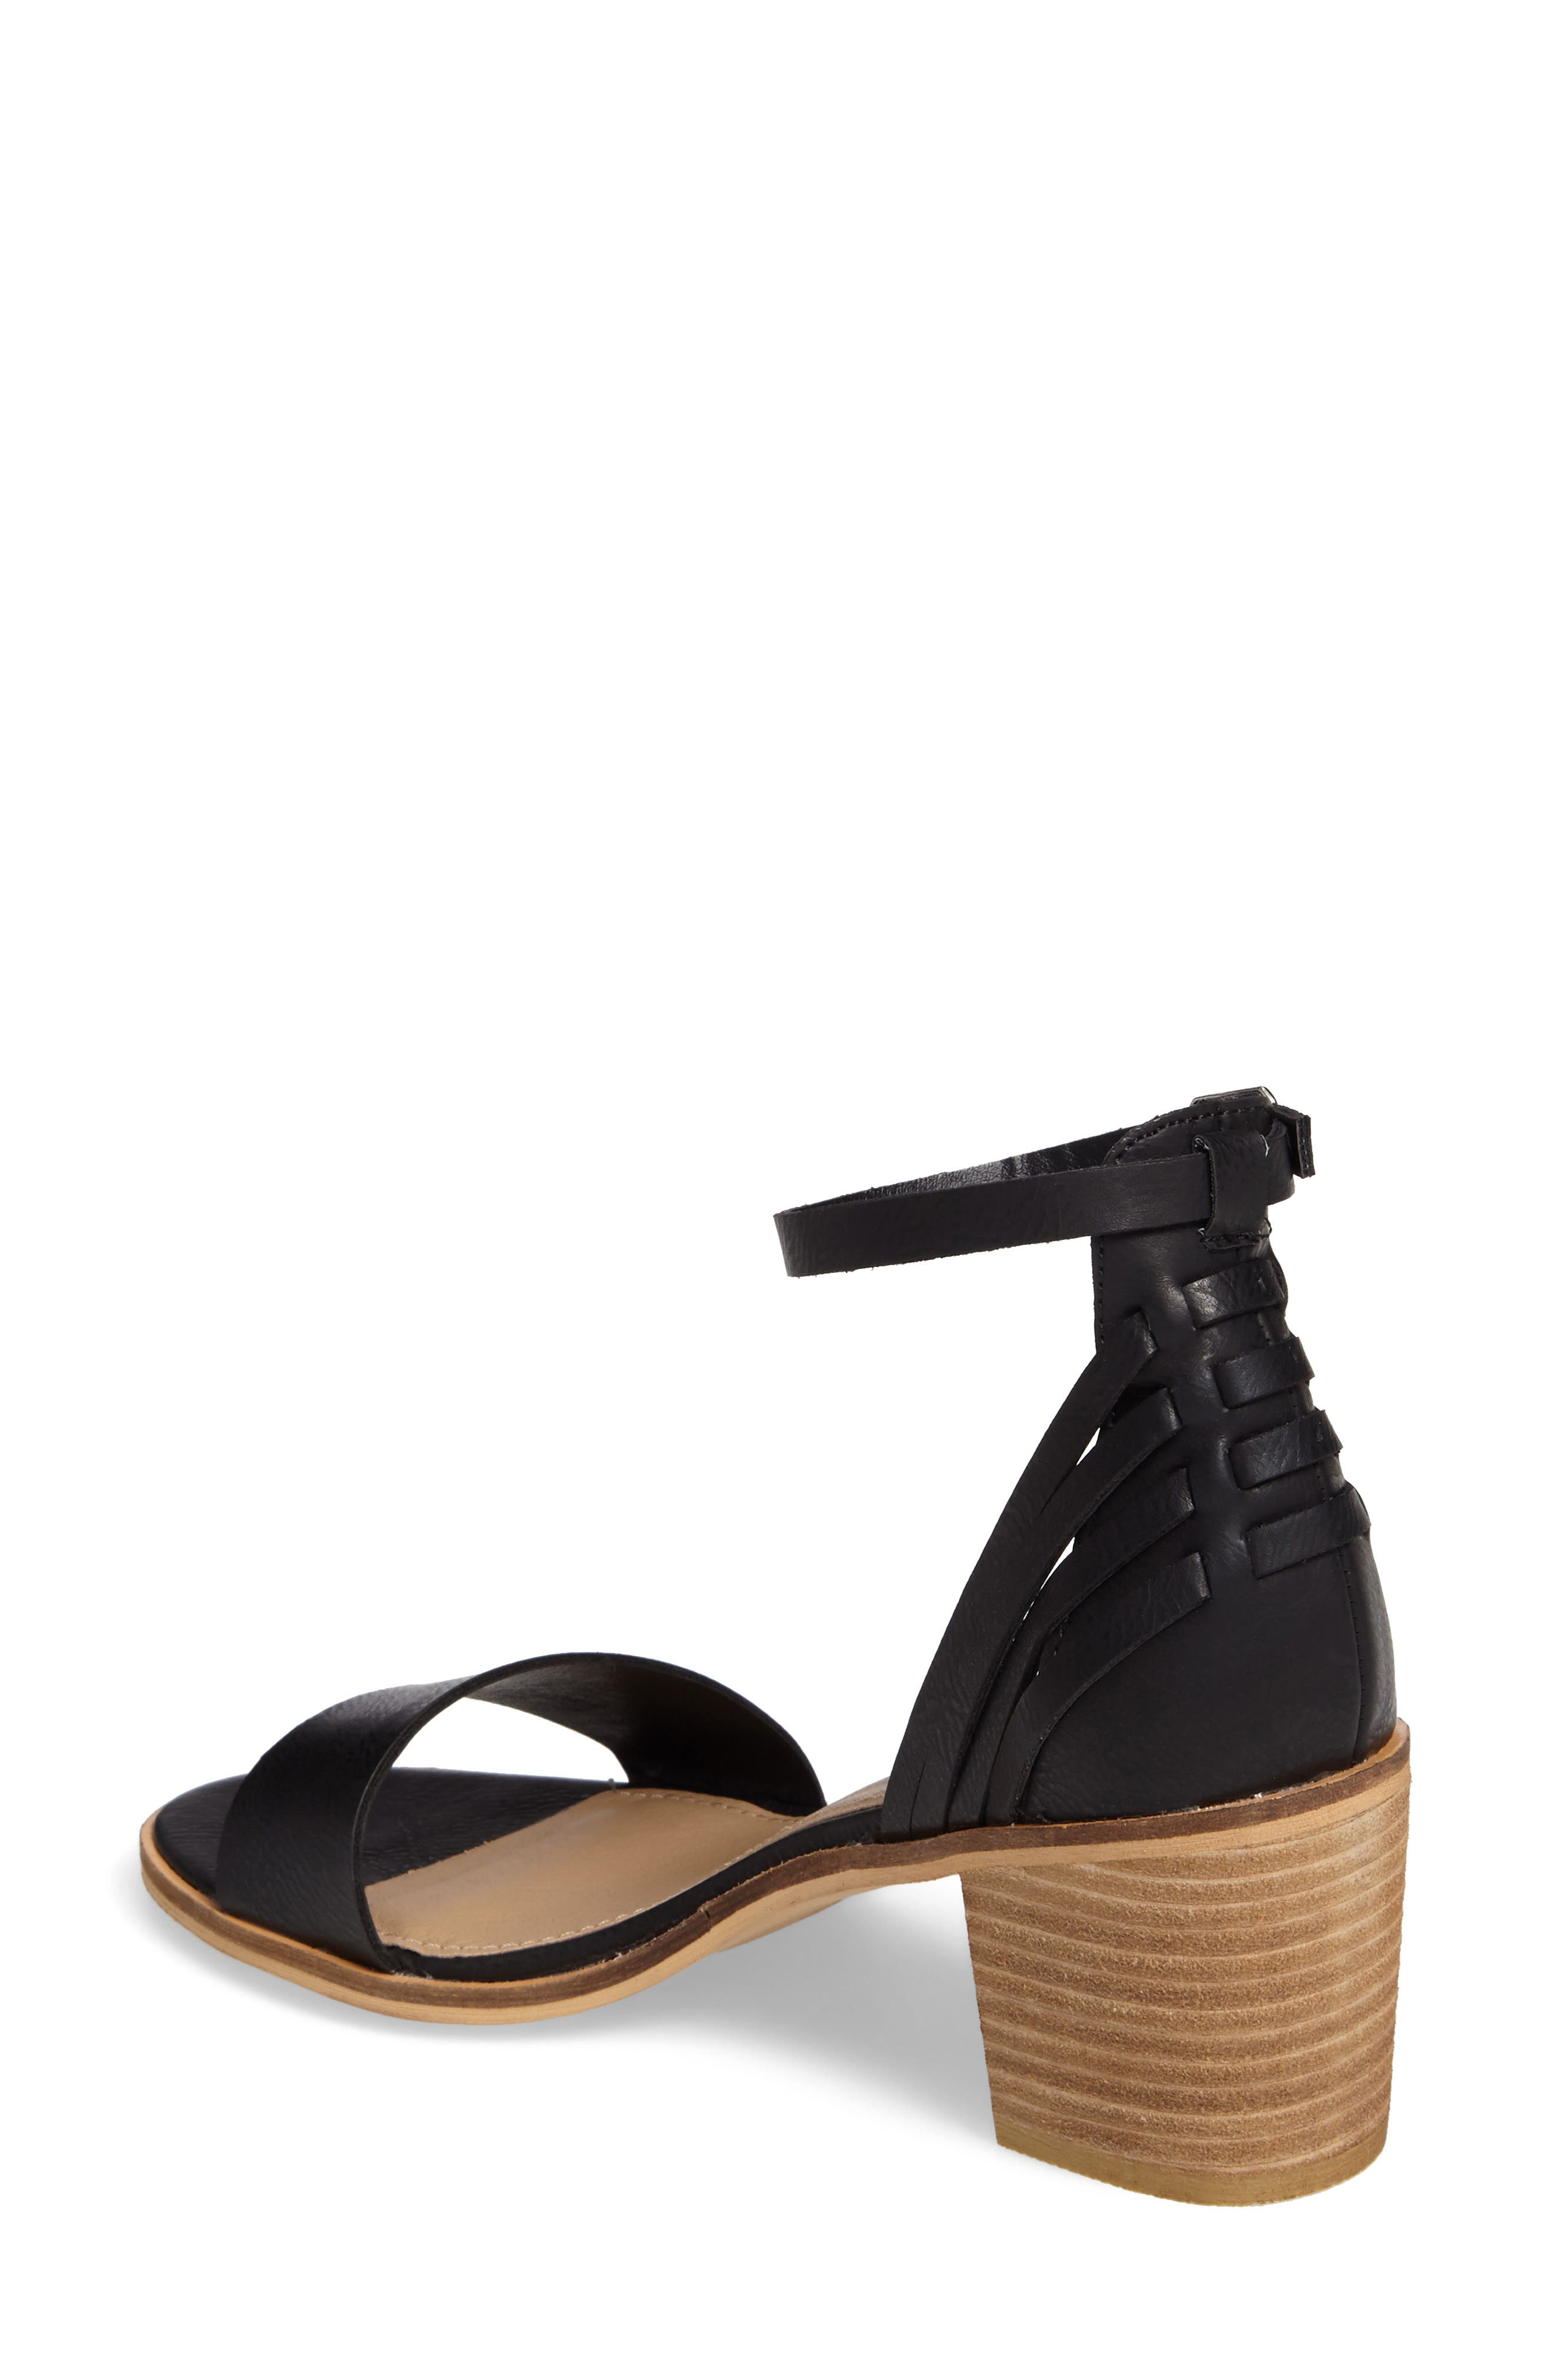 Fars Block Heel Sandal,                             Alternate thumbnail 2, color,                             001